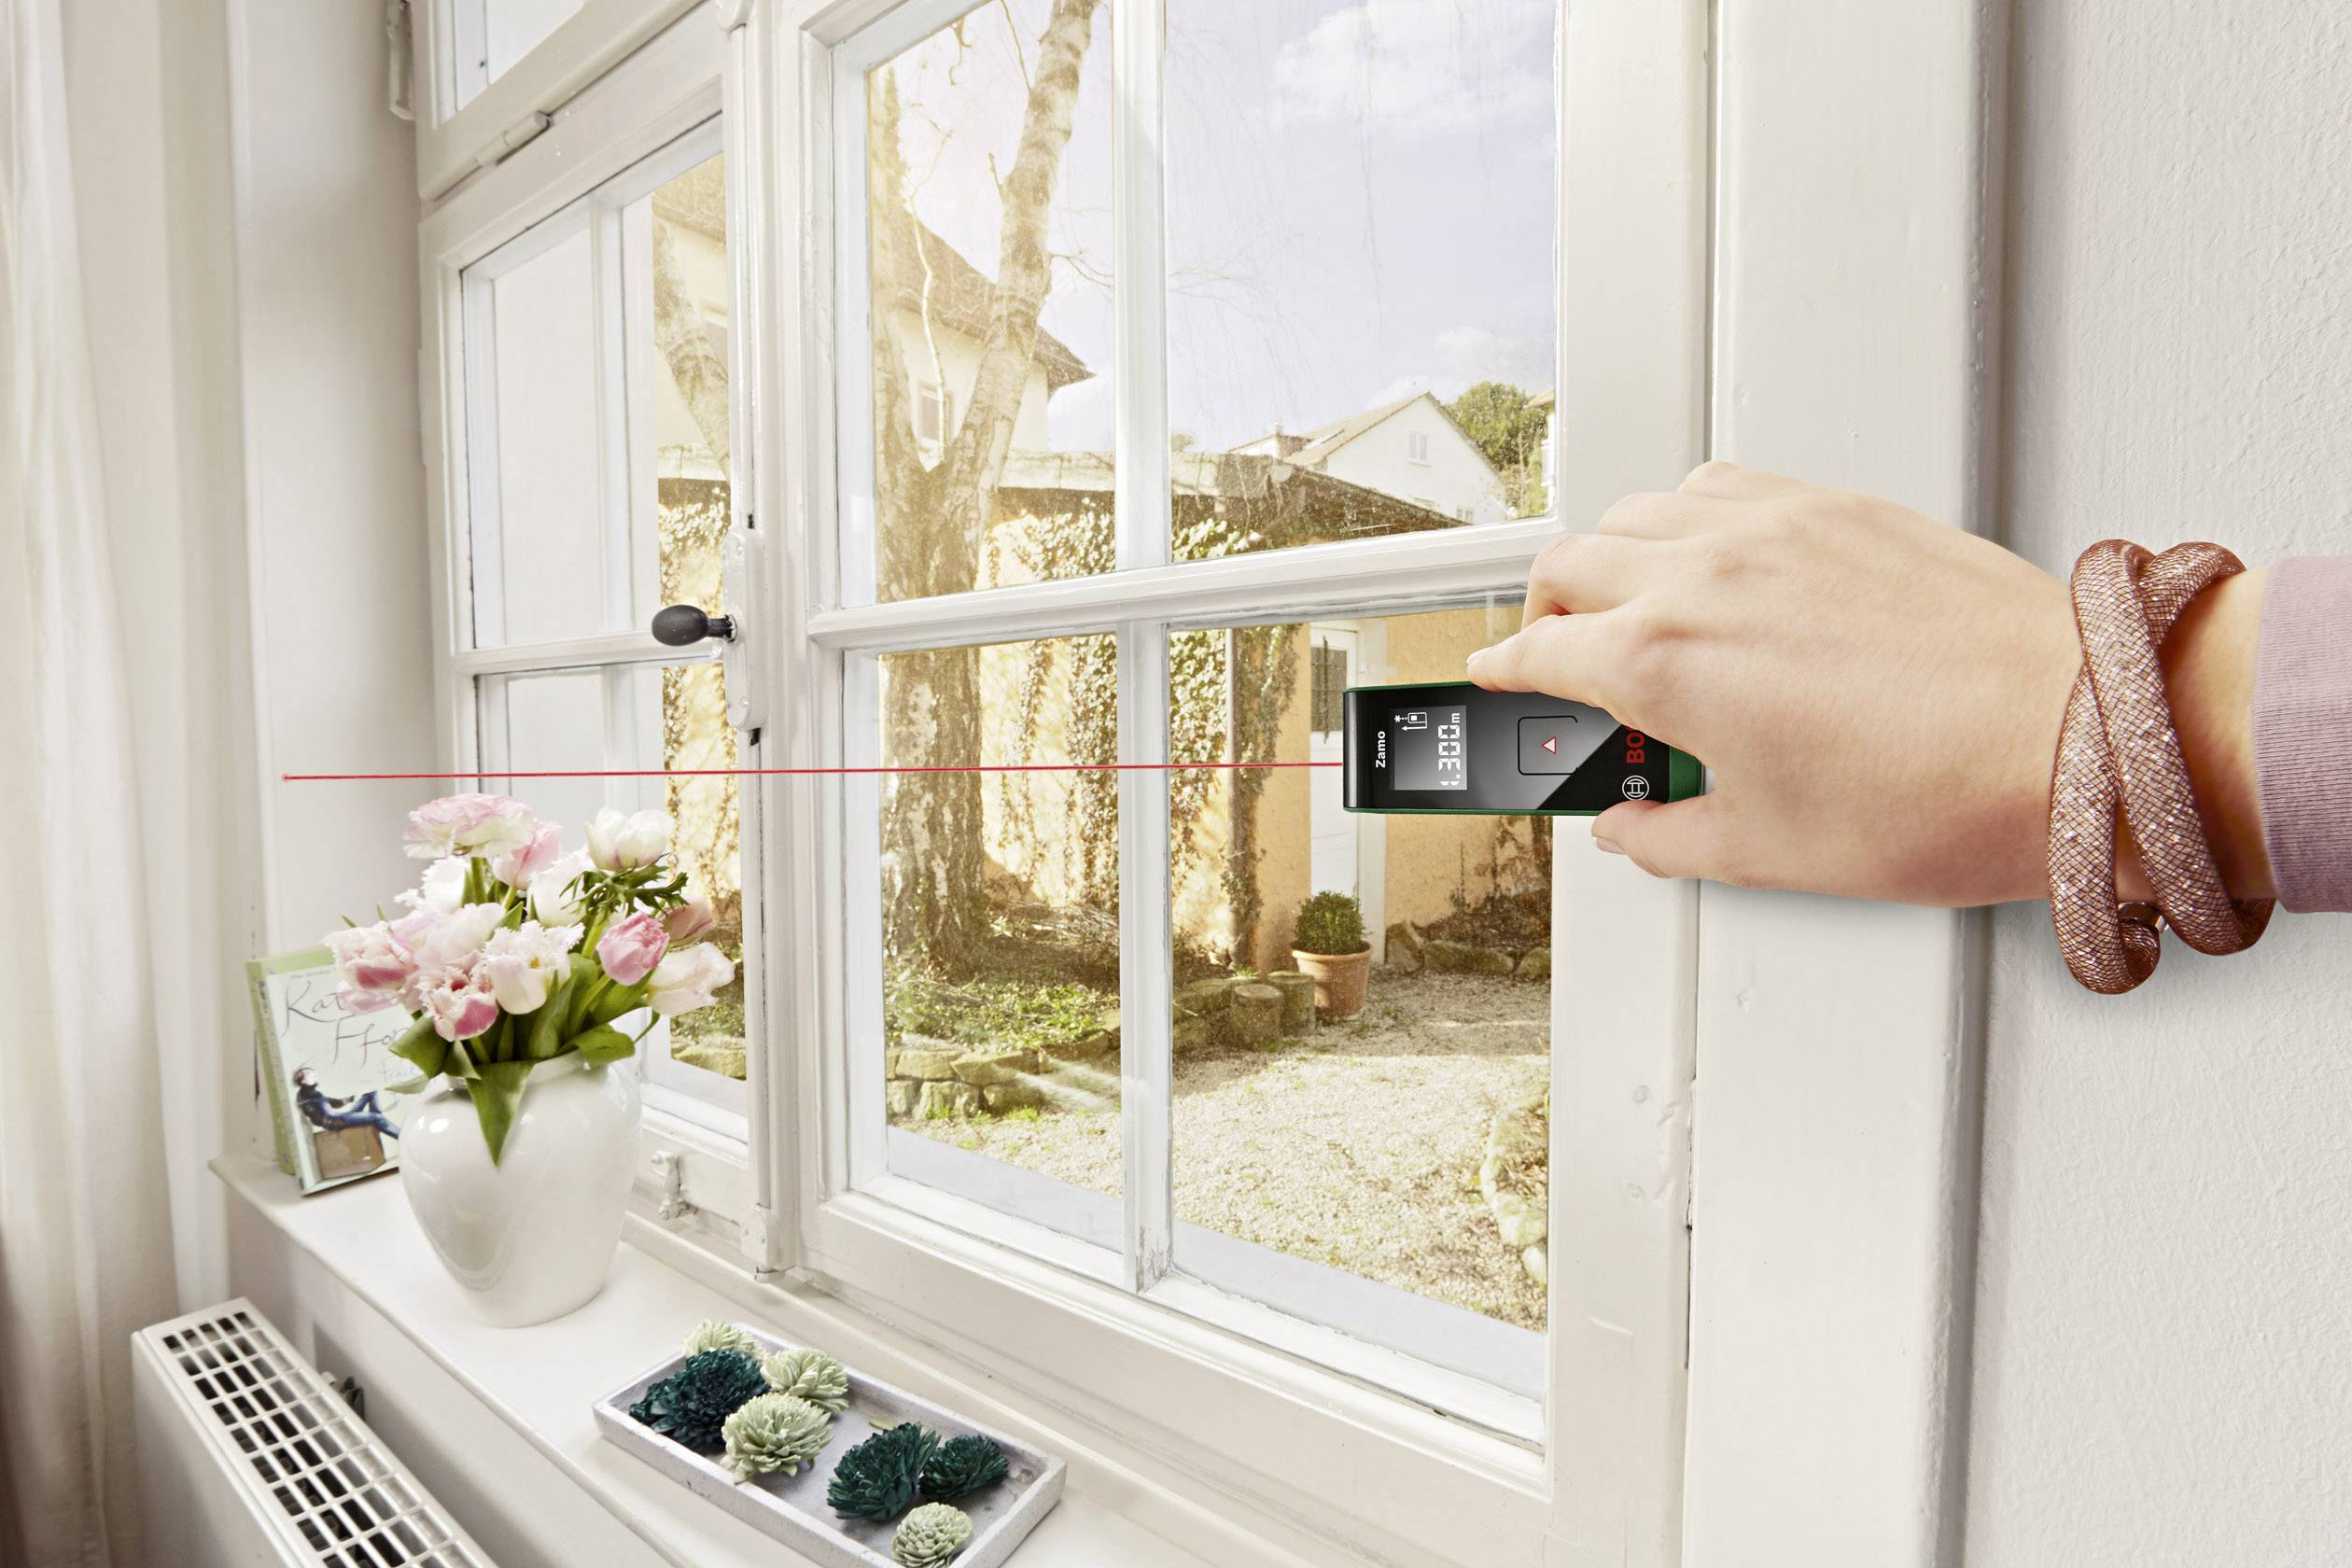 Laser Entfernungsmesser Zamo 2 : Bosch home and garden zamo ii laser entfernungsmesser messbereich